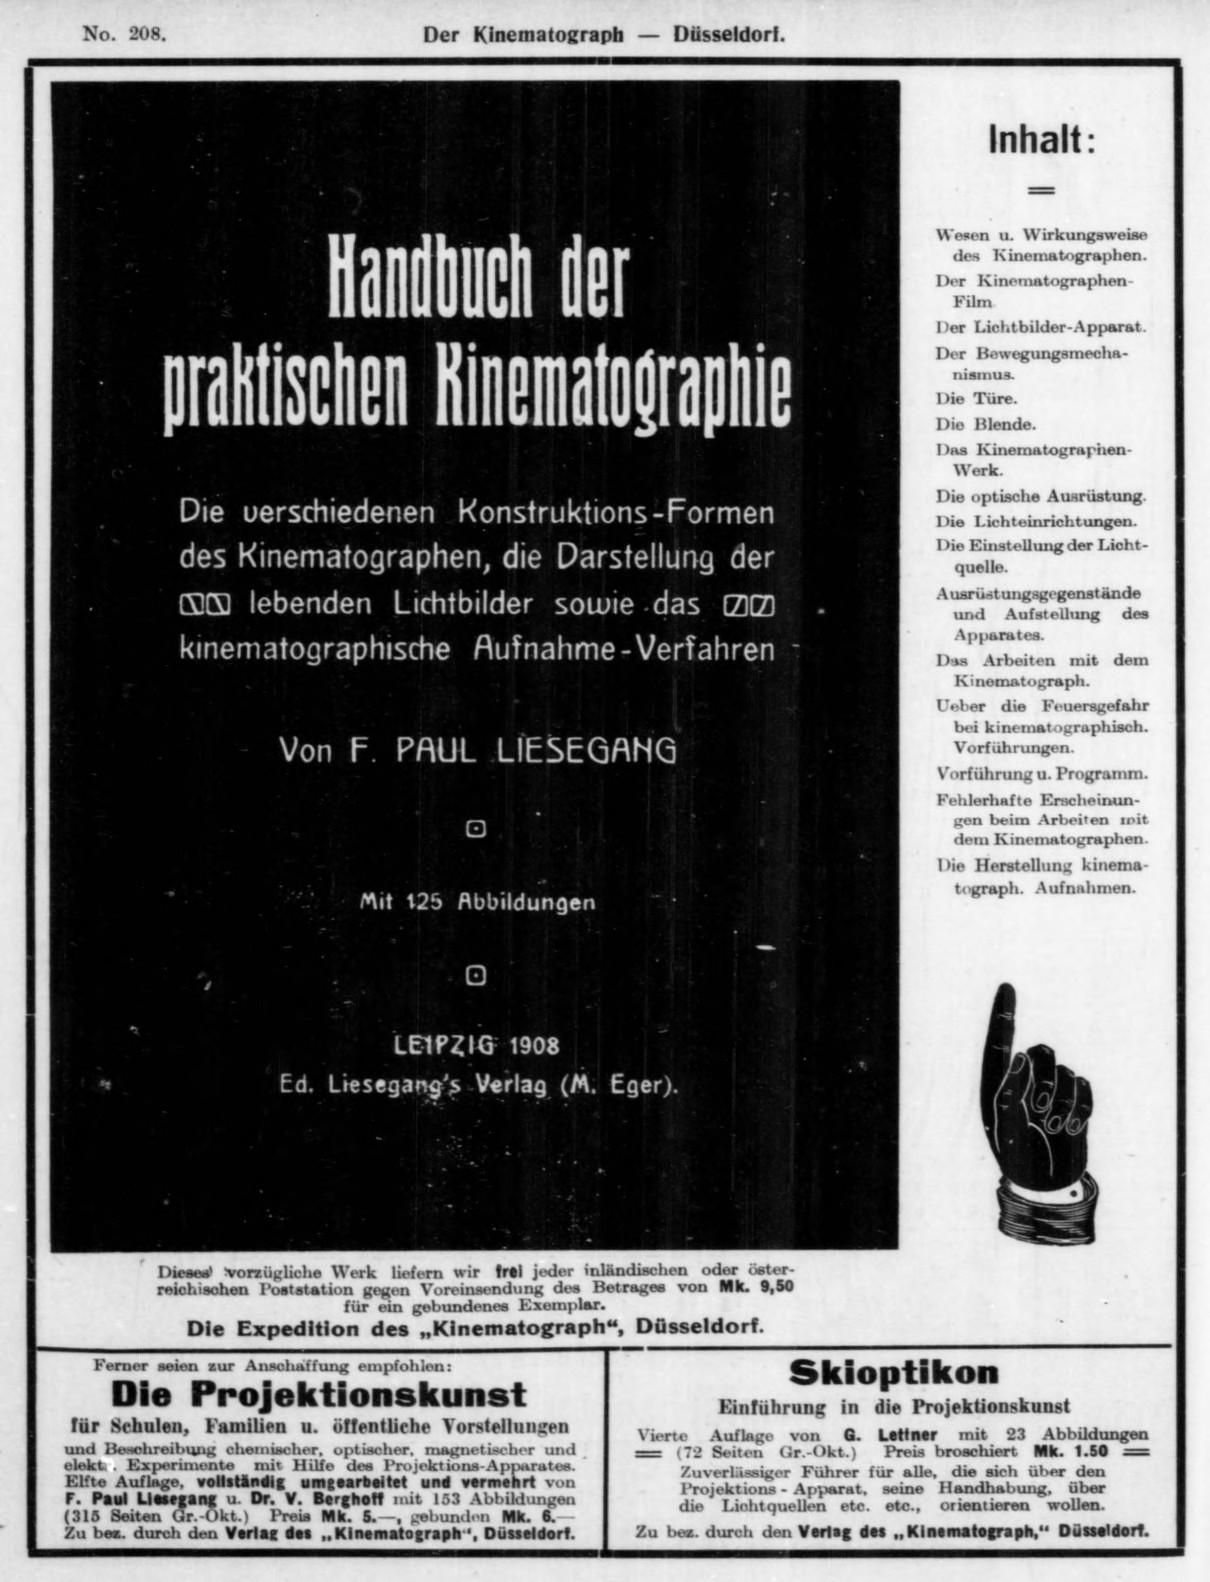 Kinematograph04-1910-12_jp2.zip&file=kinematograph04-1910-12_jp2%2fkinematograph04-1910-12_0075